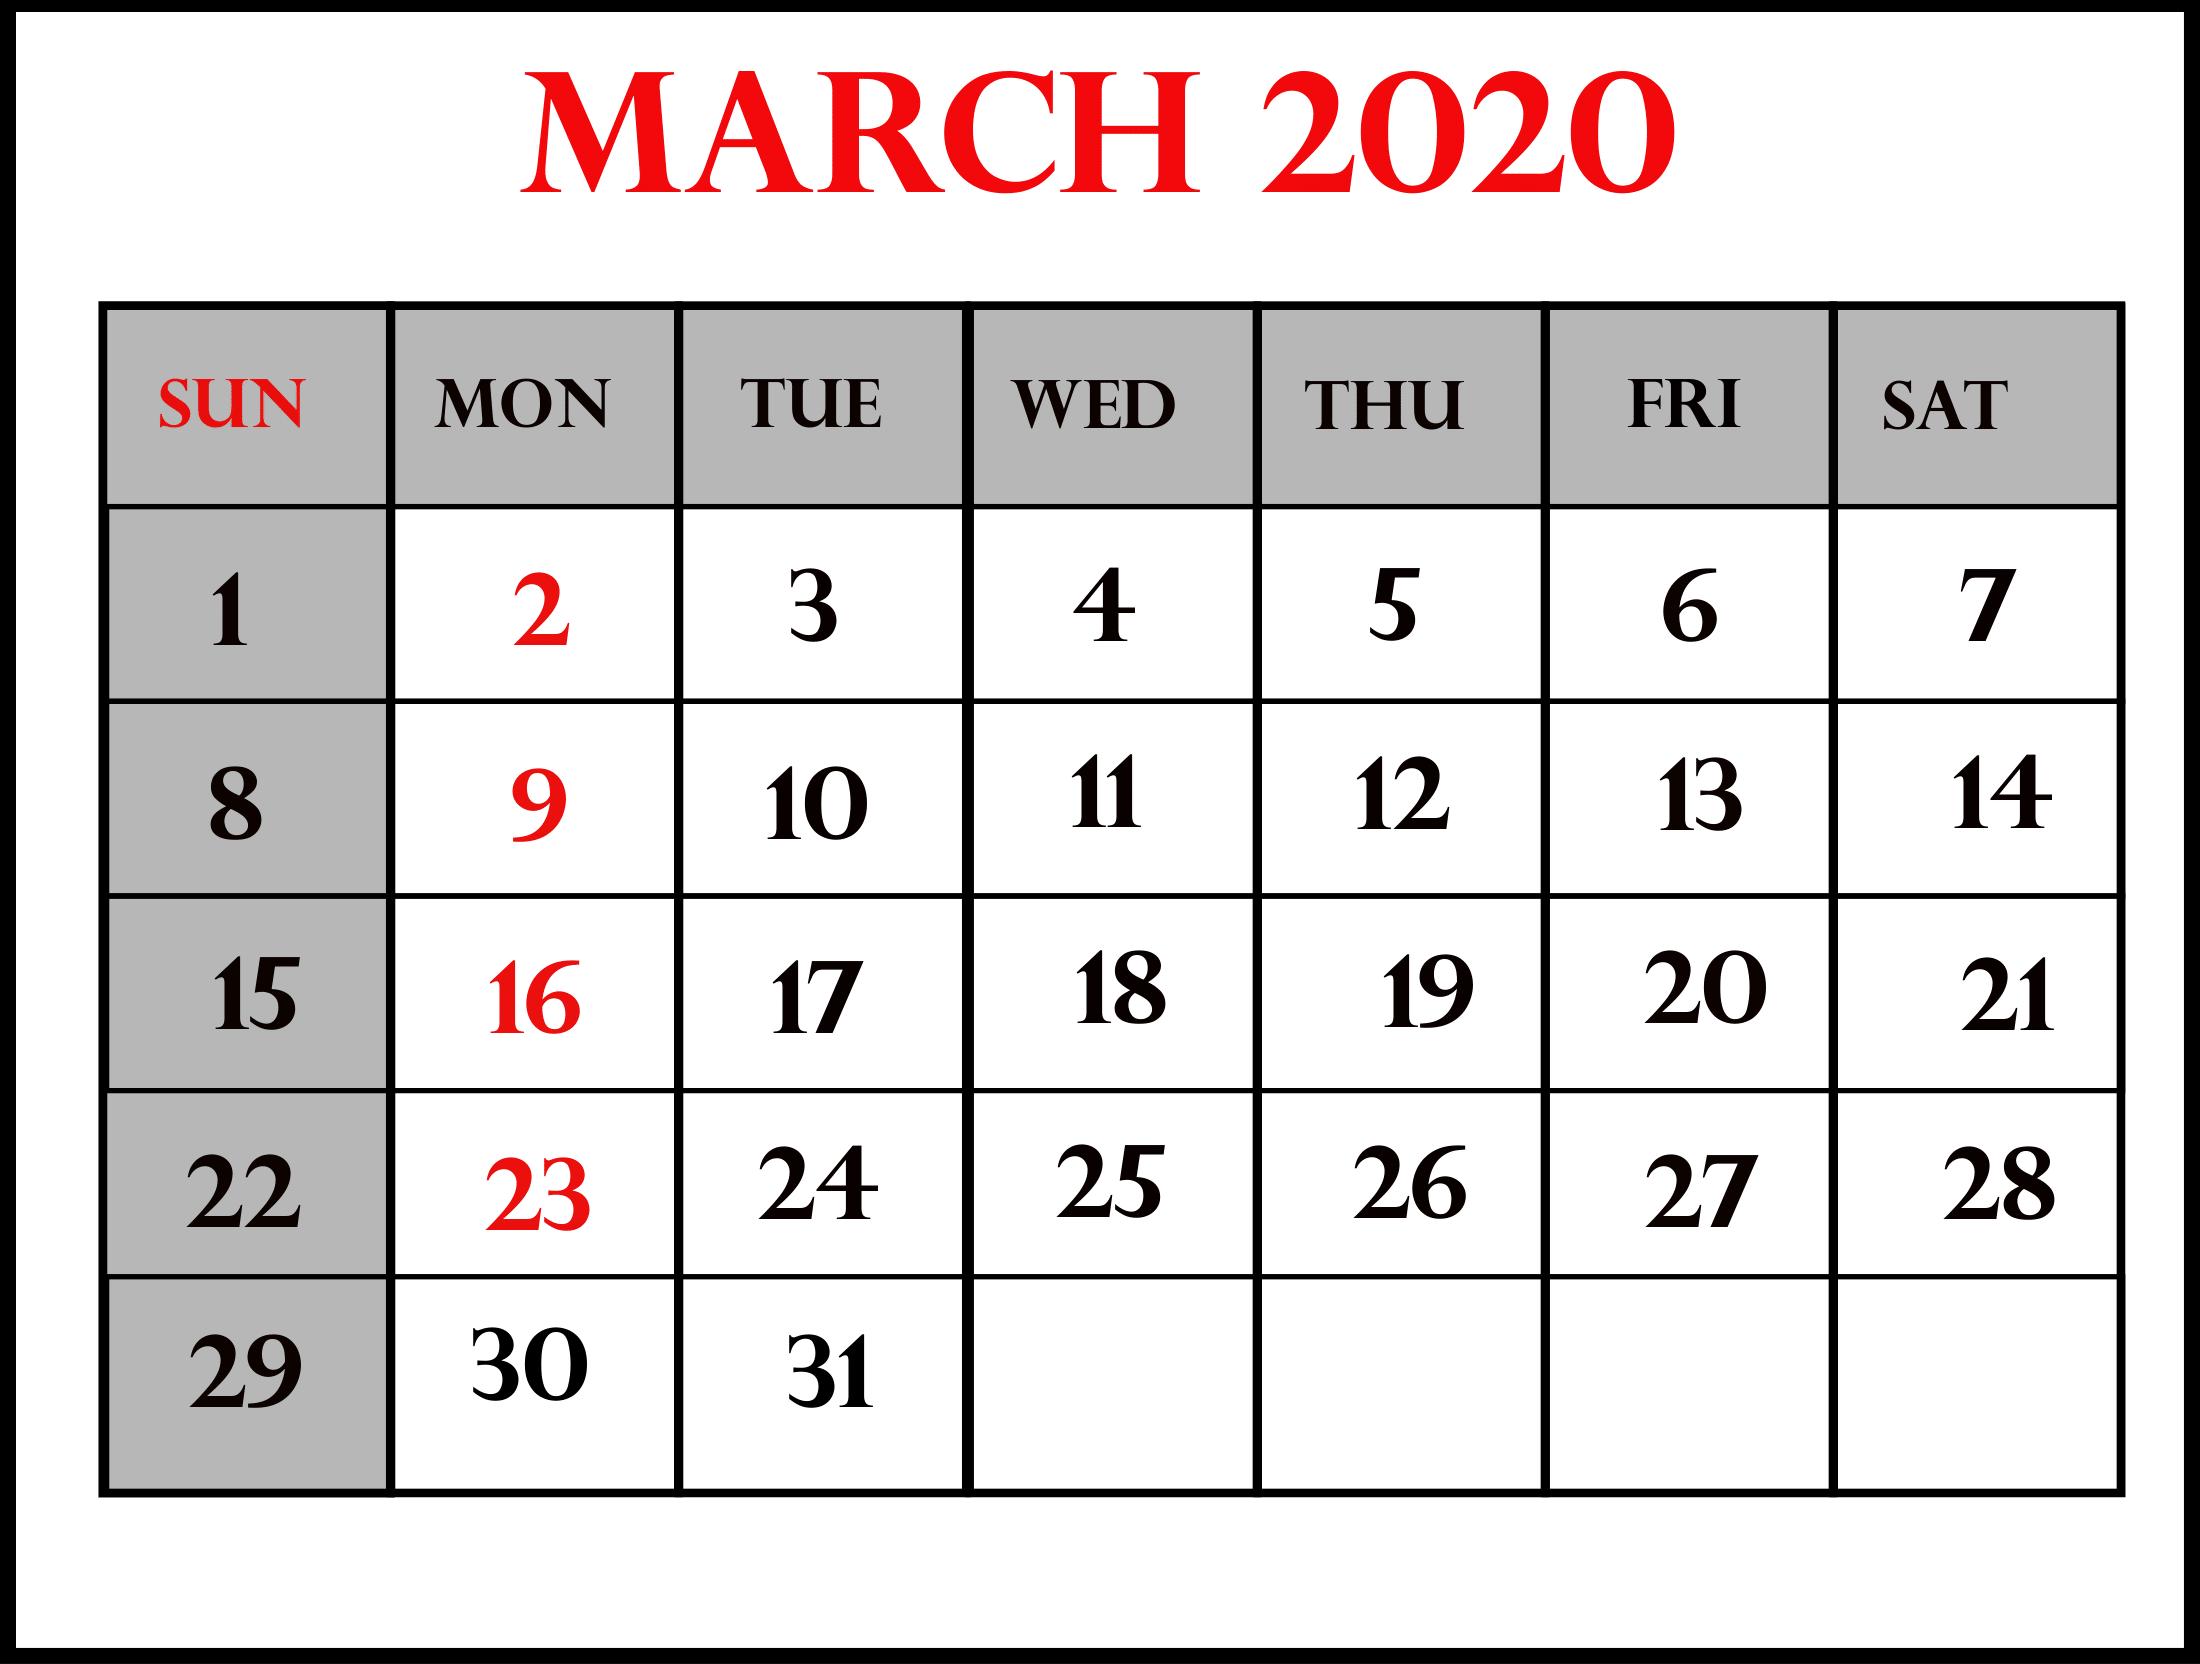 March Calendar 2020 Printable PDF